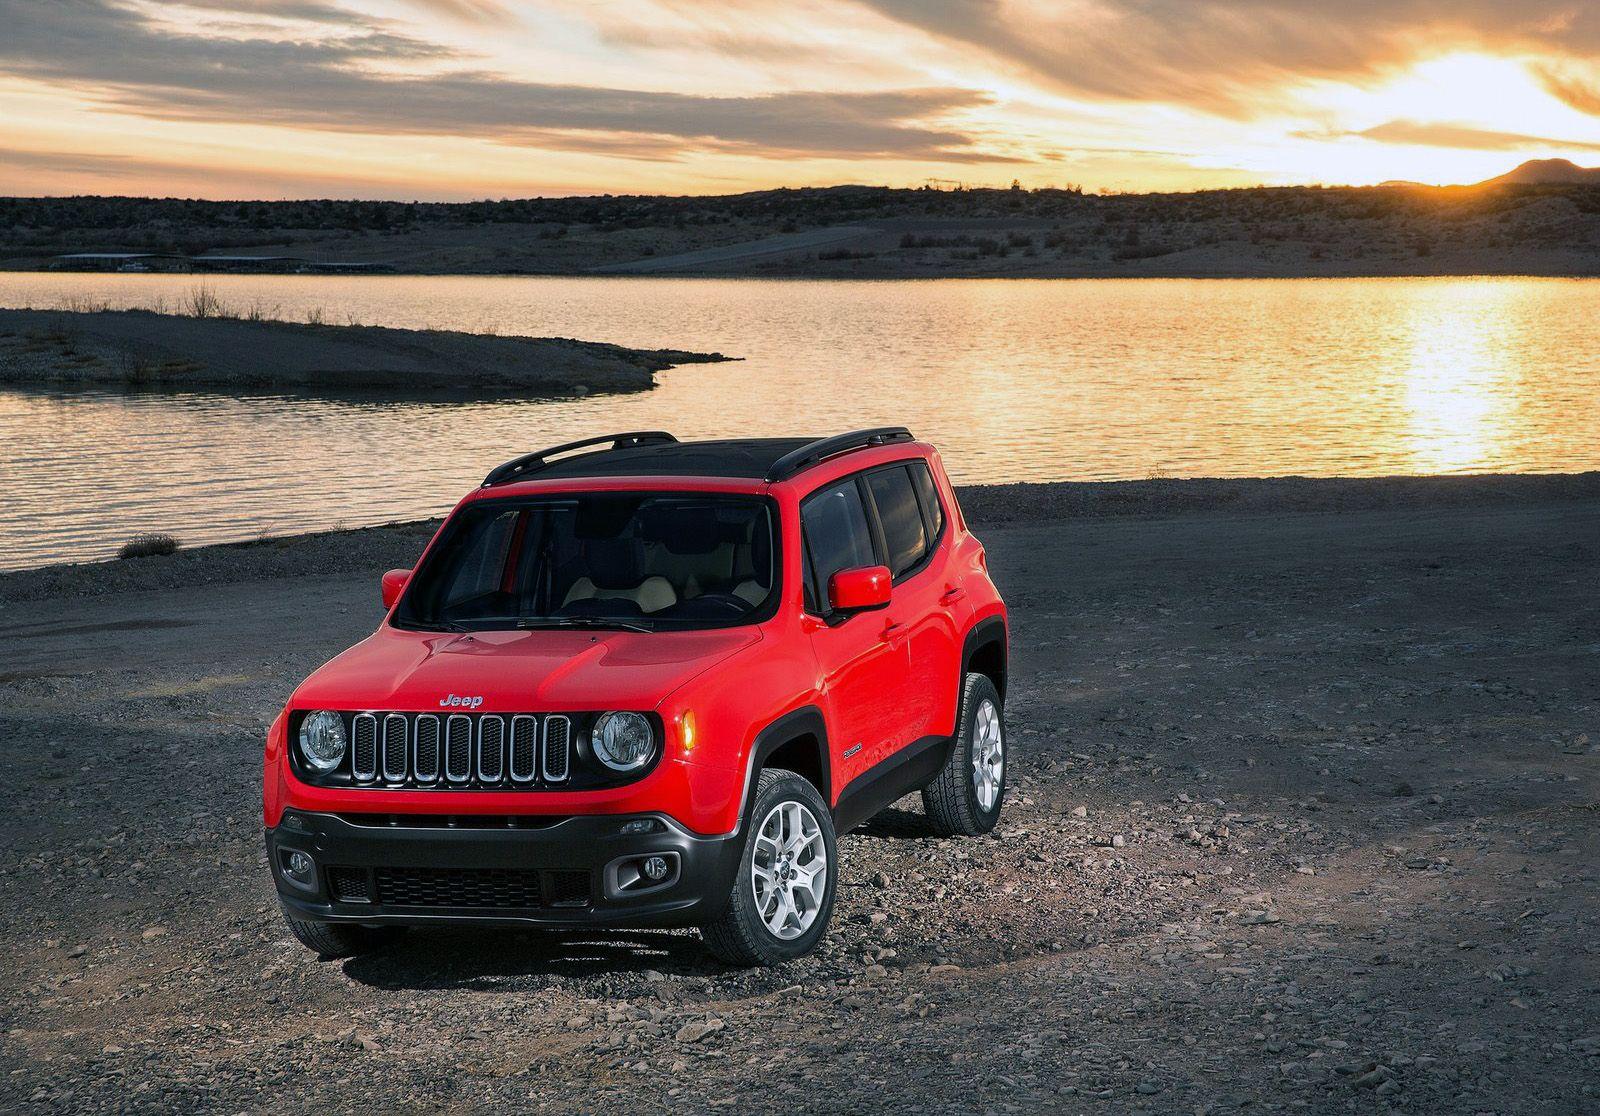 awesome Allnew 2015 Jeep Renegade Jeep renegade, Jeep